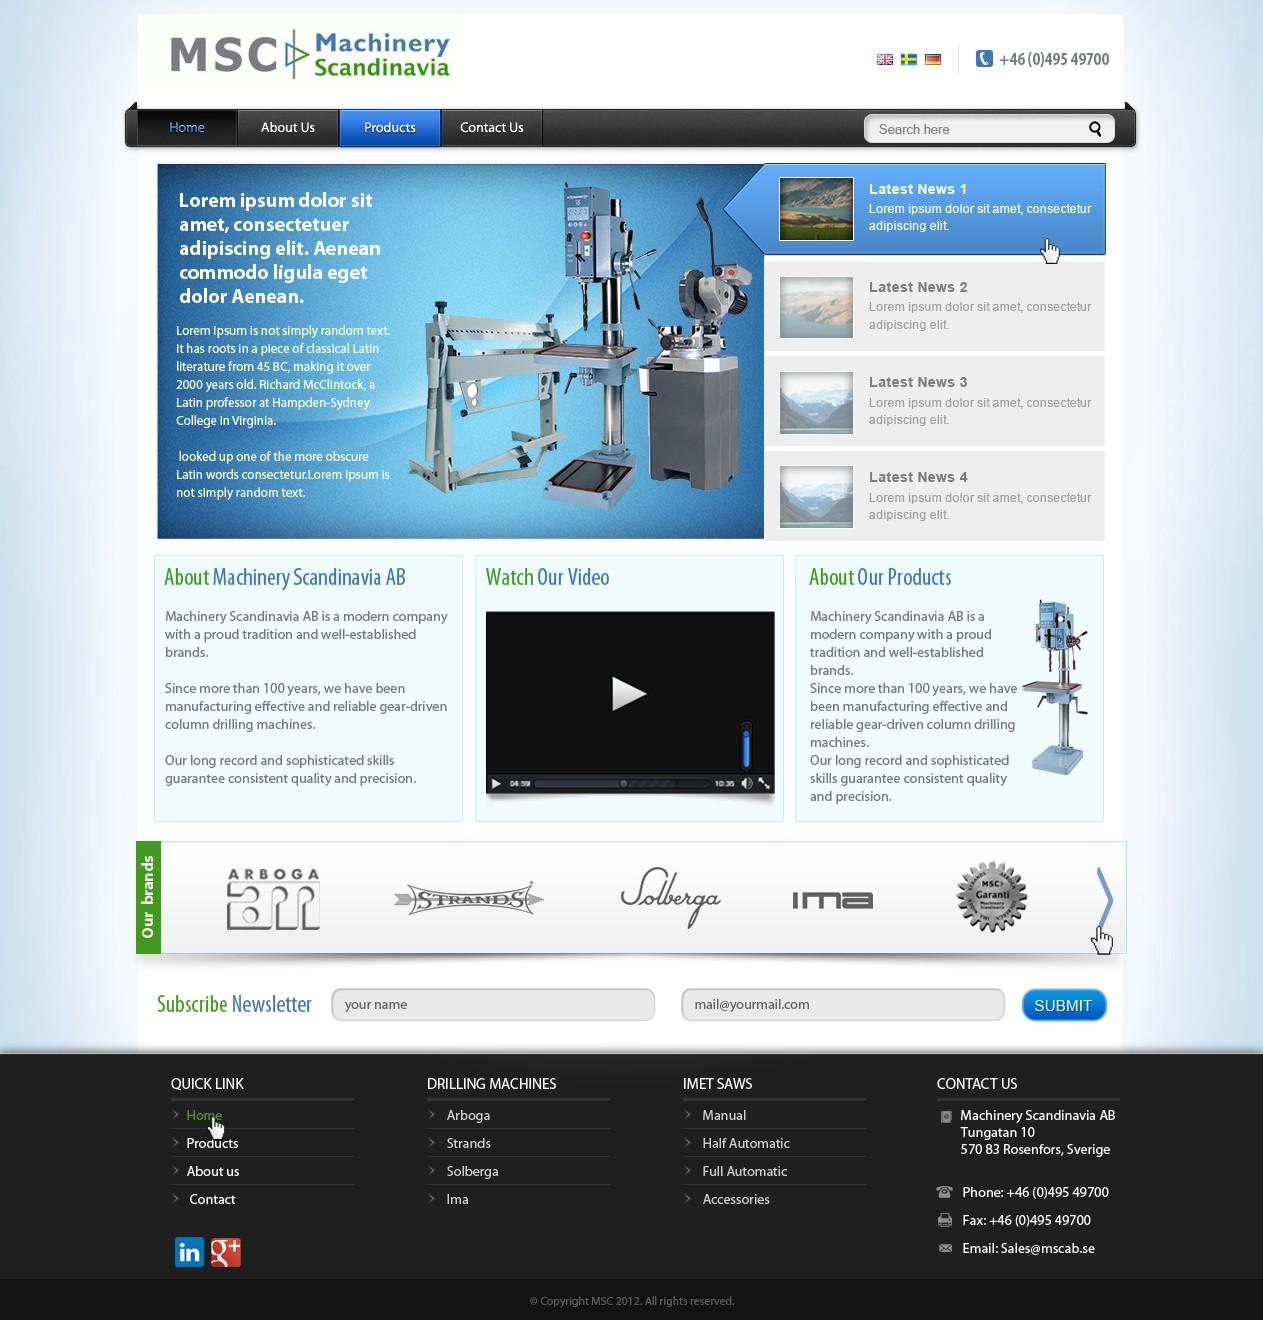 website design for Machinery Scandinavia AB